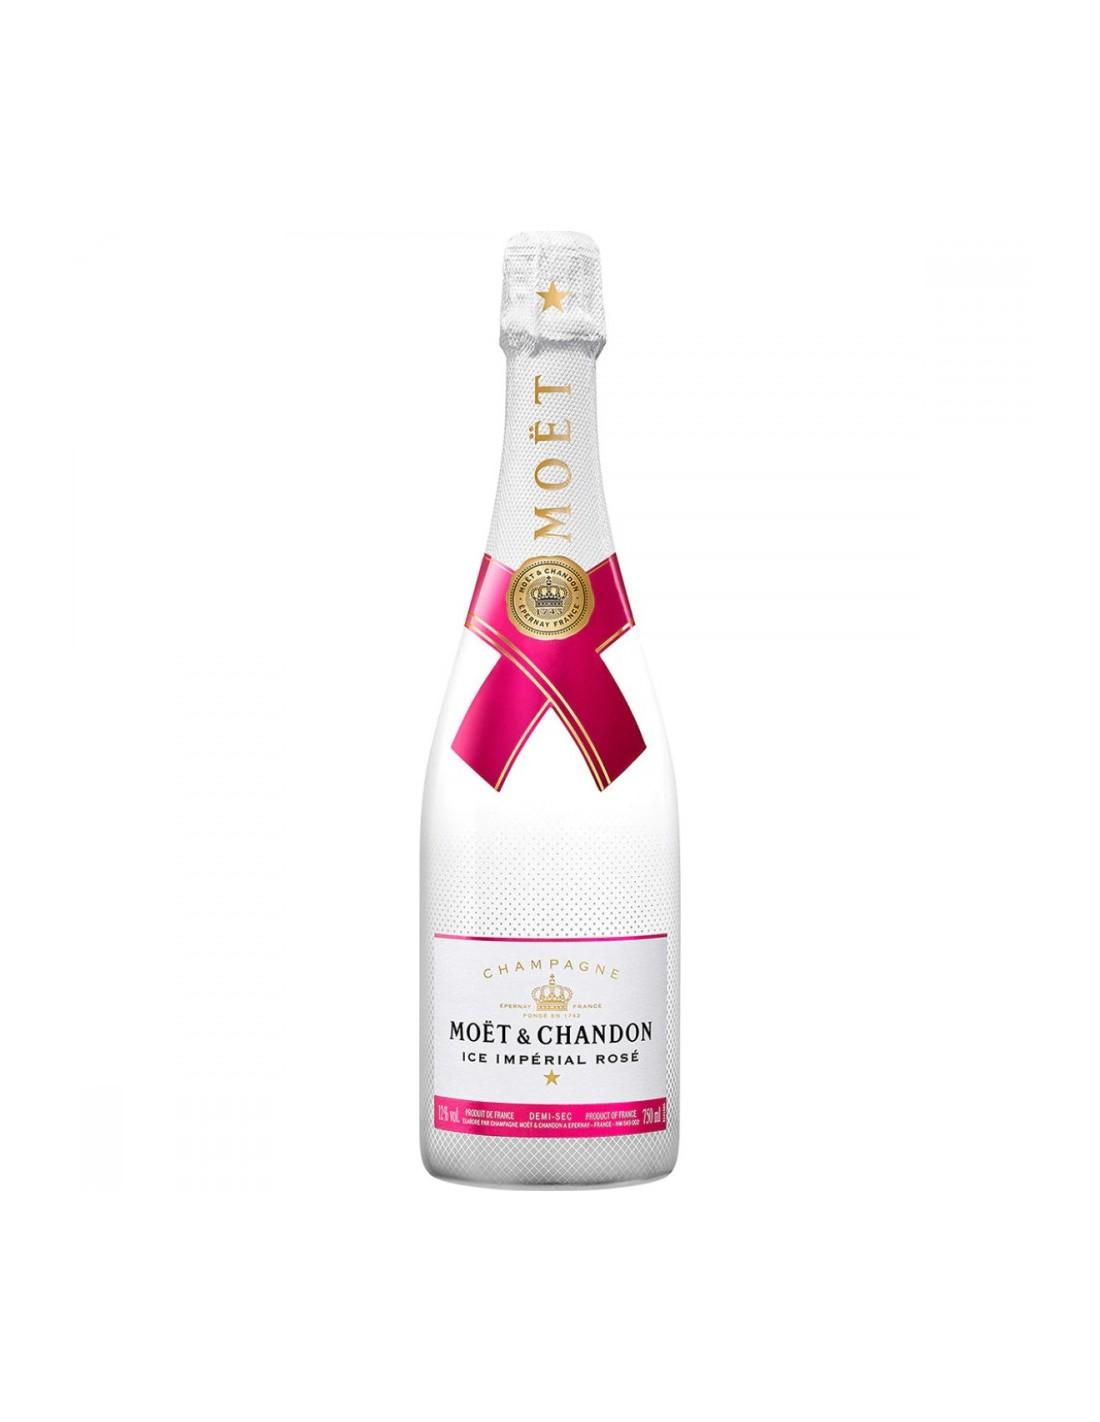 Sampanie Moët & Chandon Rosé Impérial Champagne, 12% alc., 0.75L, Franta